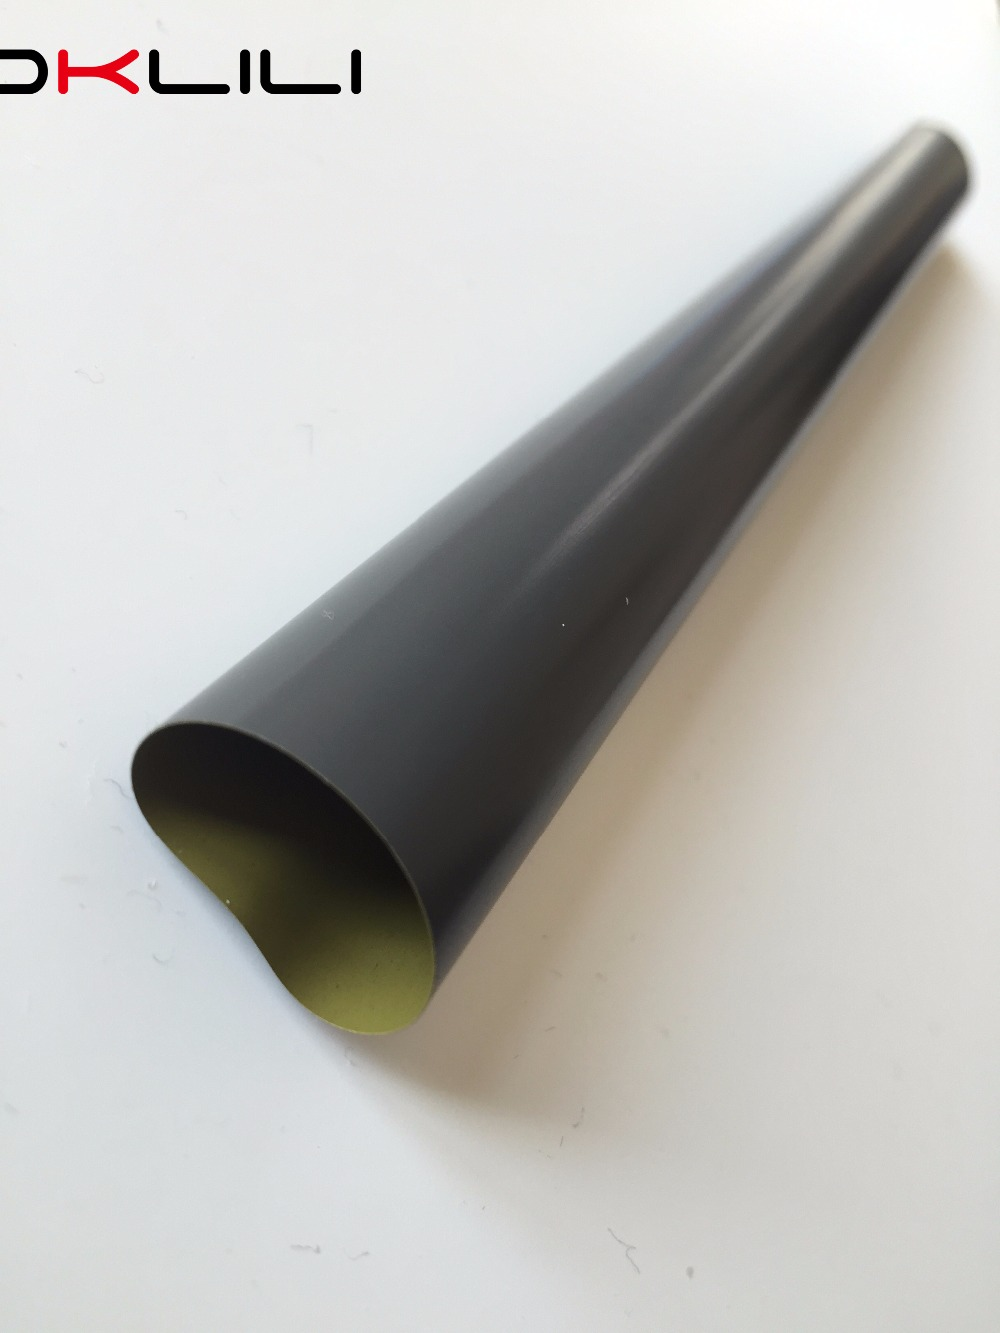 10X Fuser ფილმის ყდის HP 1000 1010 1015 1020 1050 - საოფისე ტექნიკა - ფოტო 2